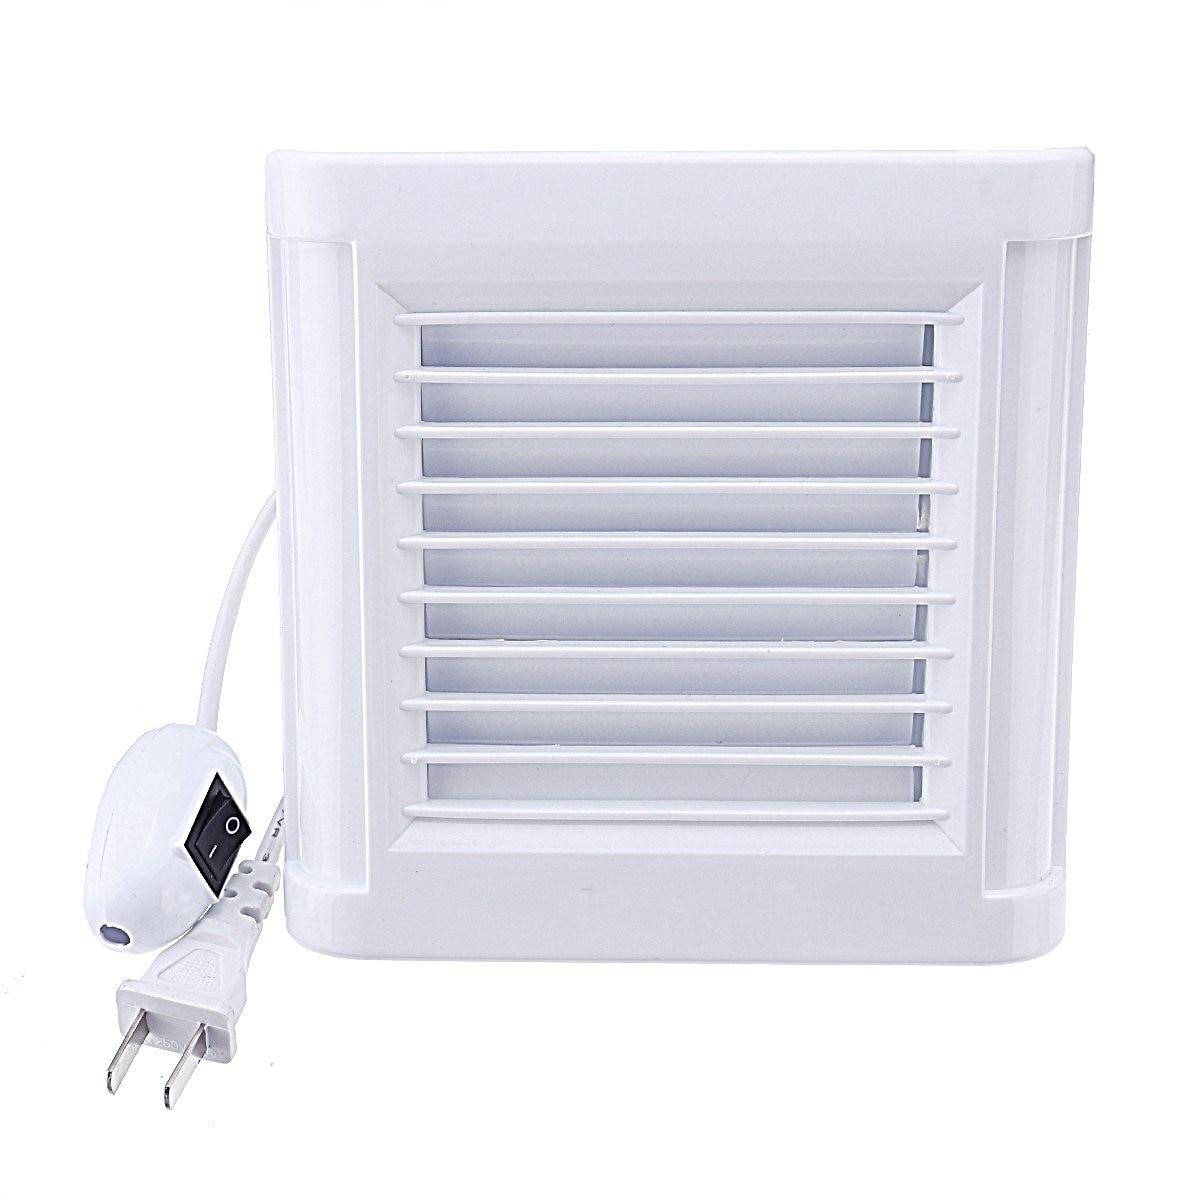 4/6 Inch Waterproof Mute Bathroom Extractor Exhaust Fan Ventilating Strong Fan For Kitchen Toilet Window Ventilation Fans 220V